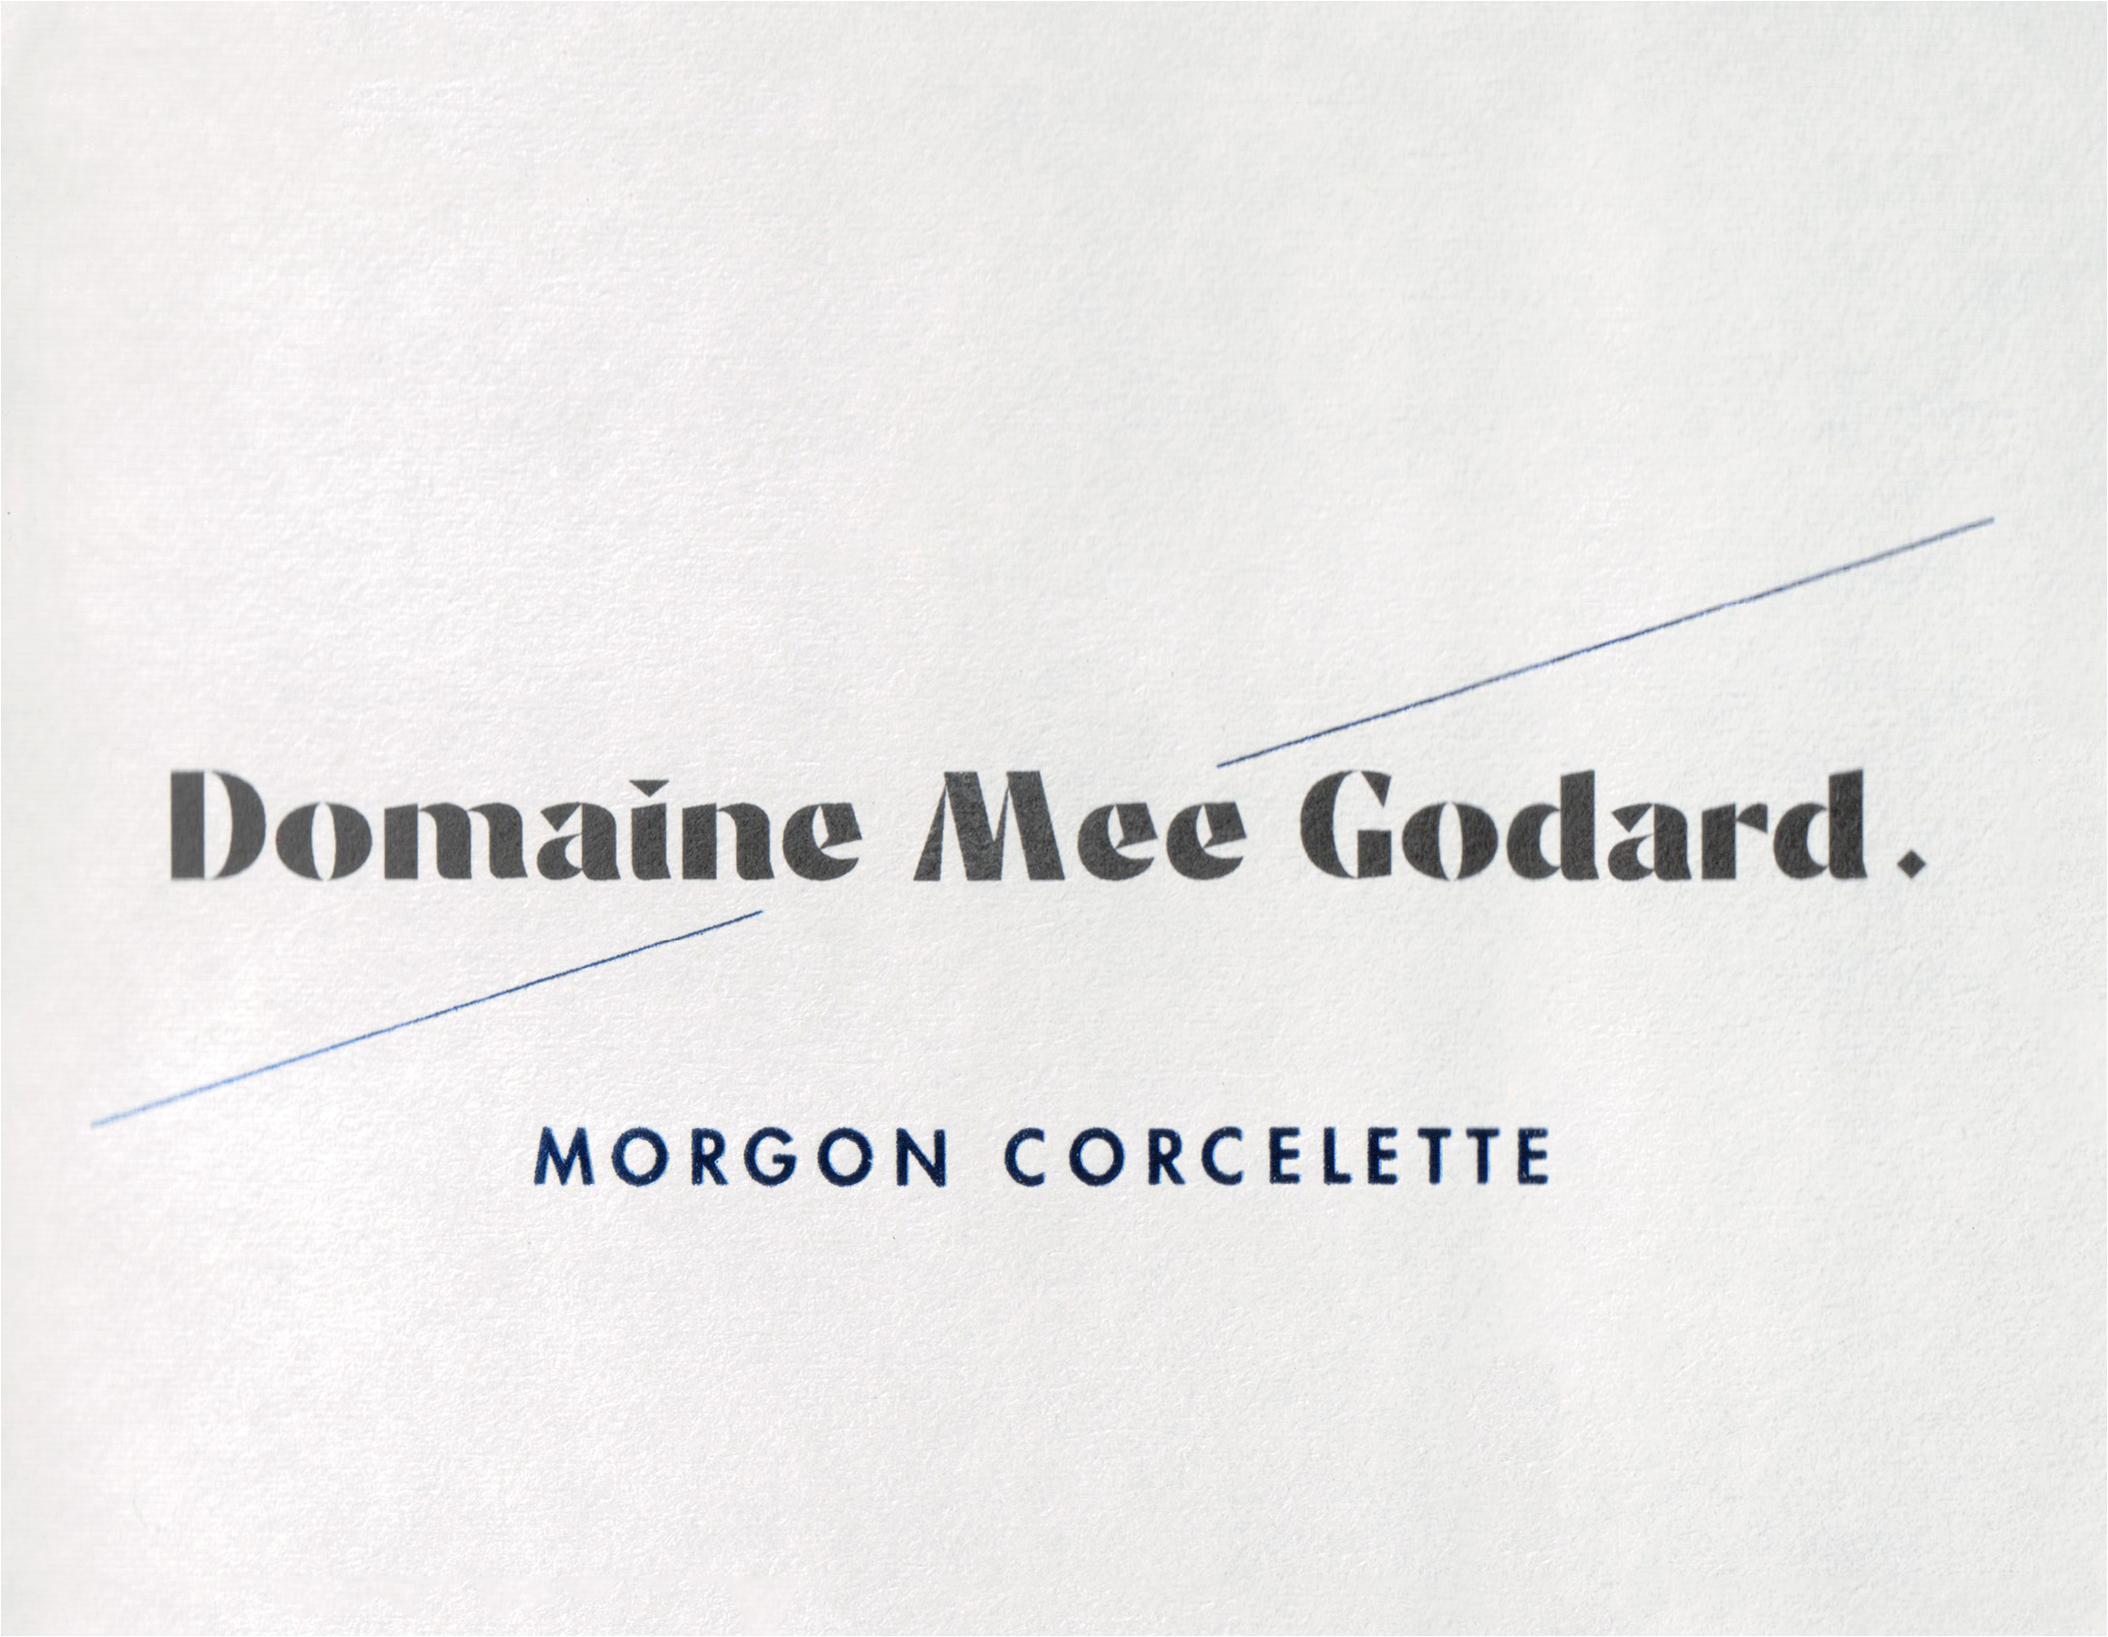 Domaine Mee Godard Morgon Corcelette 2018